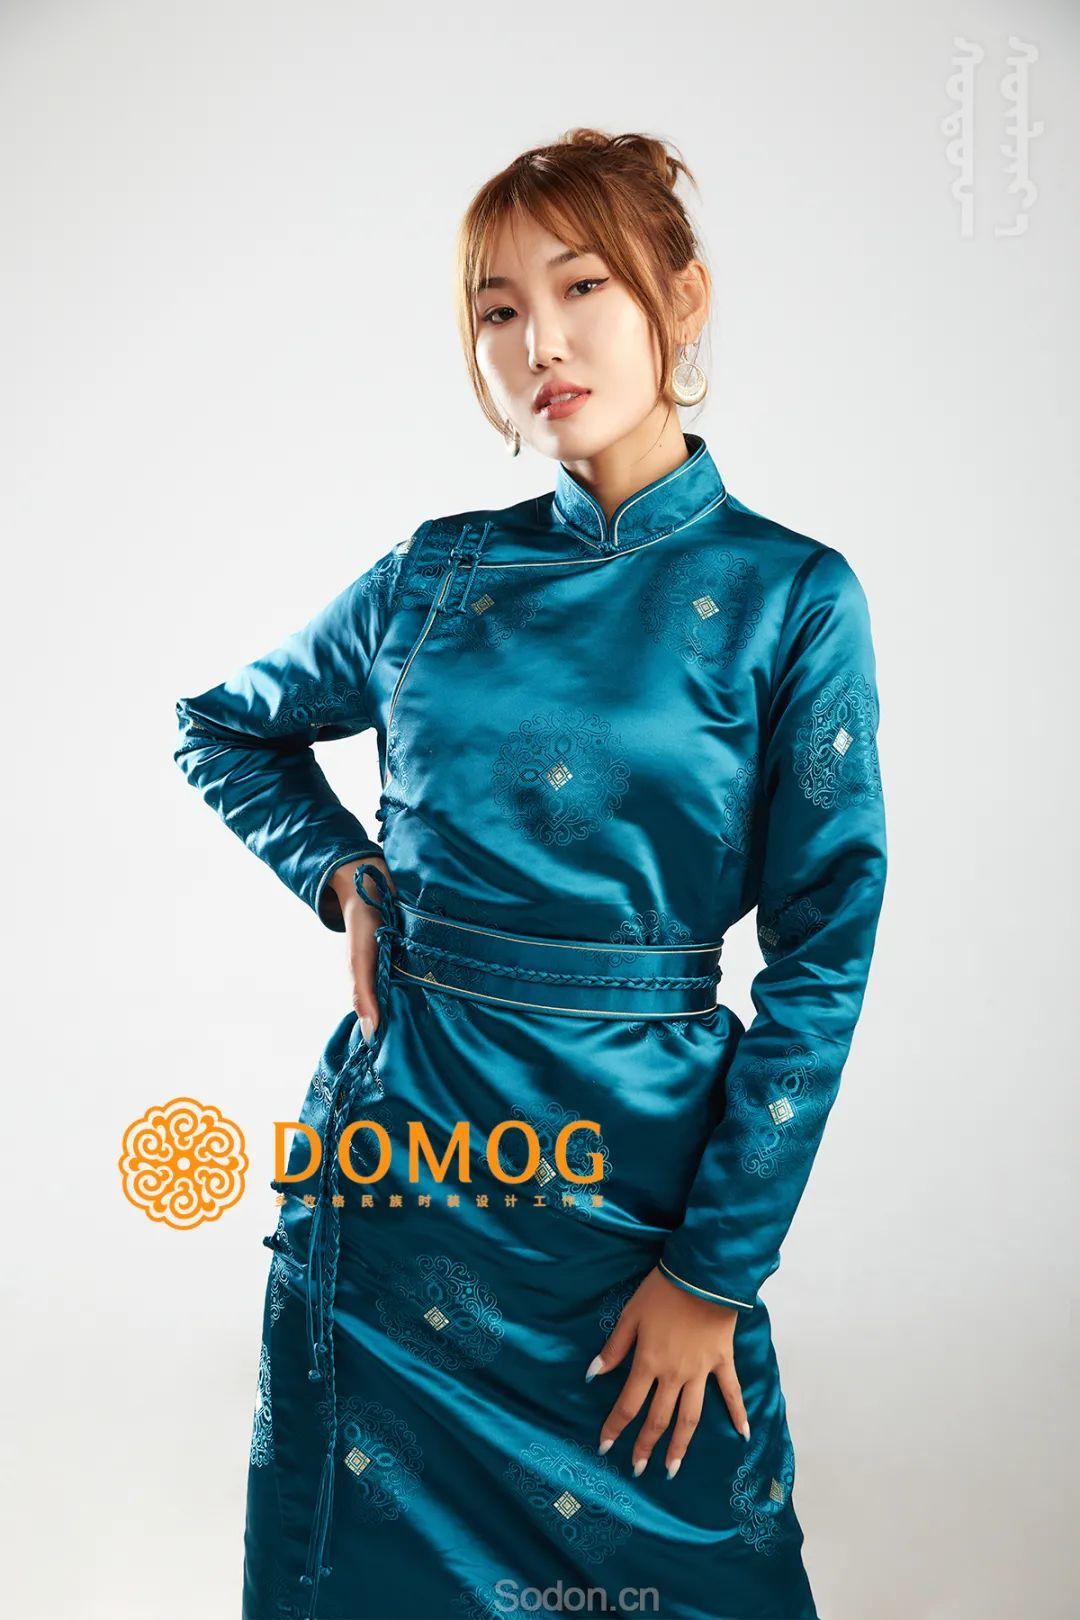 DOMOG 蒙古时装2020新款,民族与时尚的融合 第9张 DOMOG 蒙古时装2020新款,民族与时尚的融合 蒙古服饰